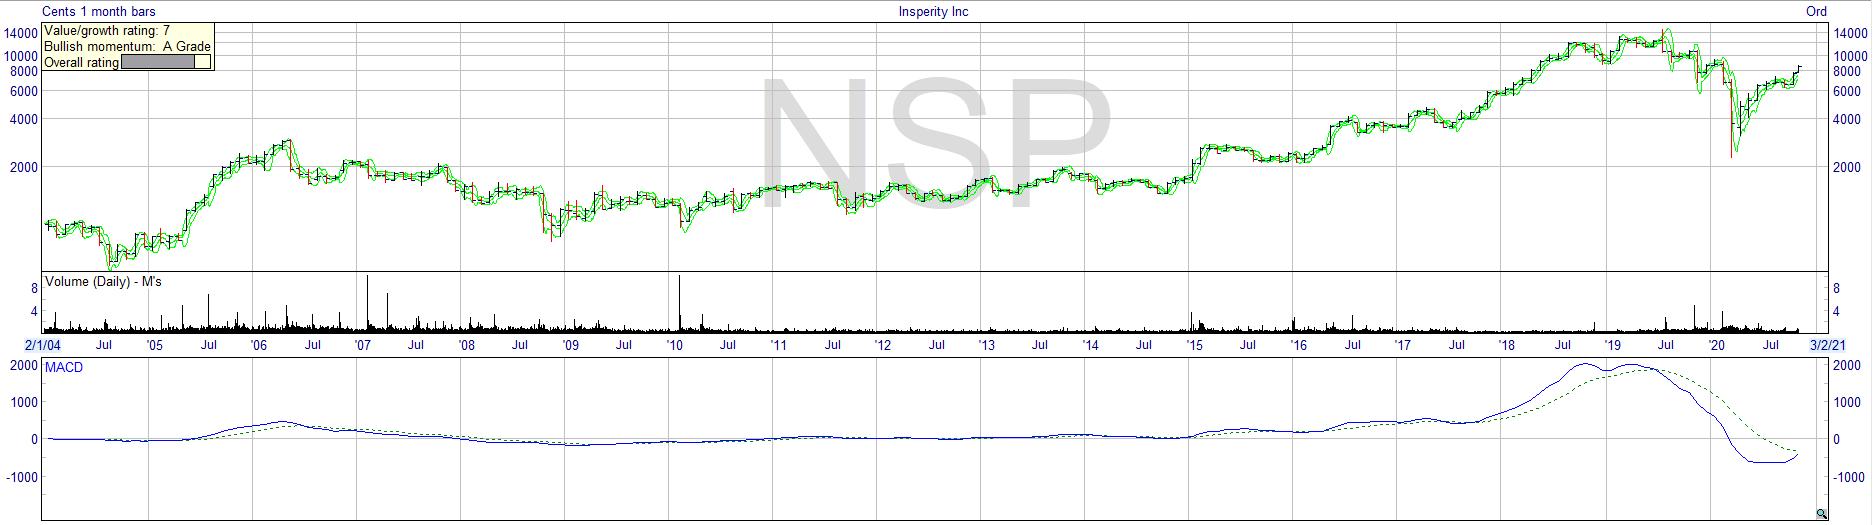 insperity_stock_chart_performance